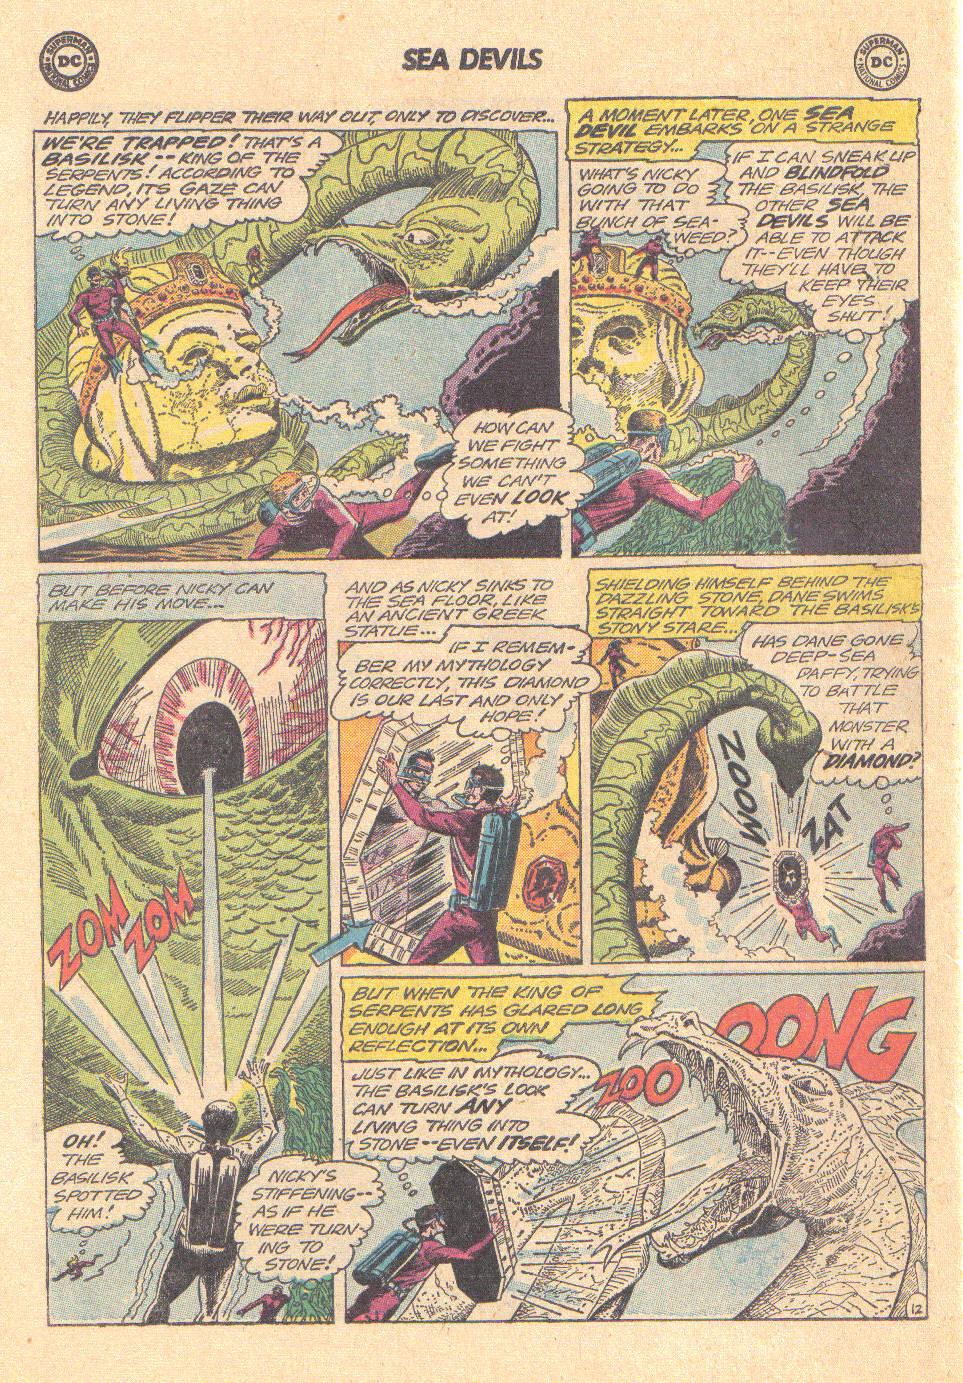 Read online Sea Devils comic -  Issue #16 - 30